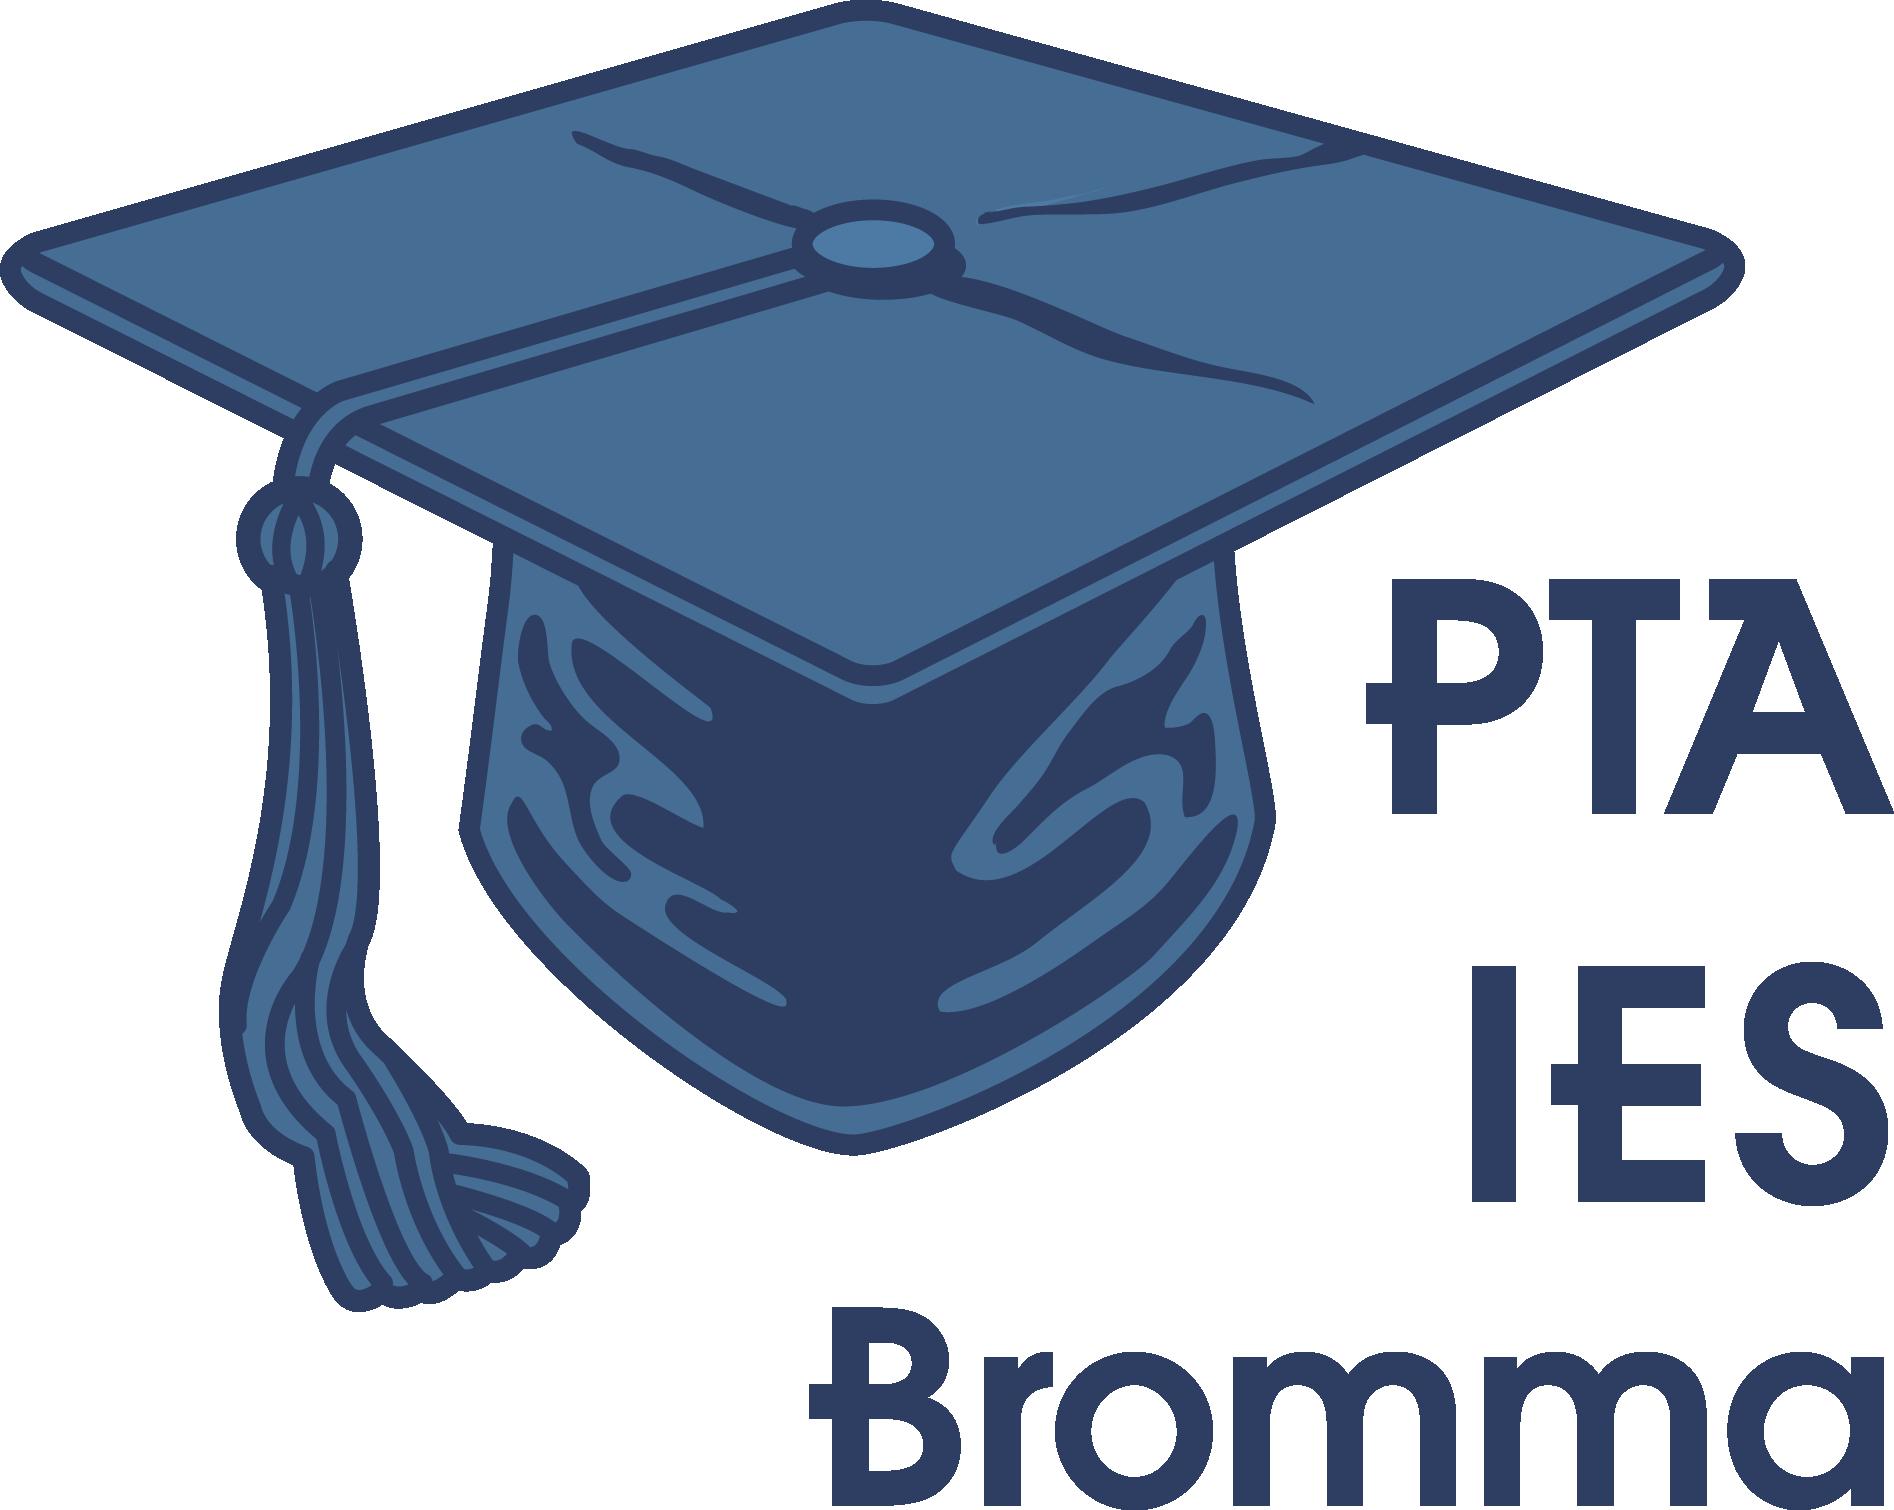 PTA Bromma